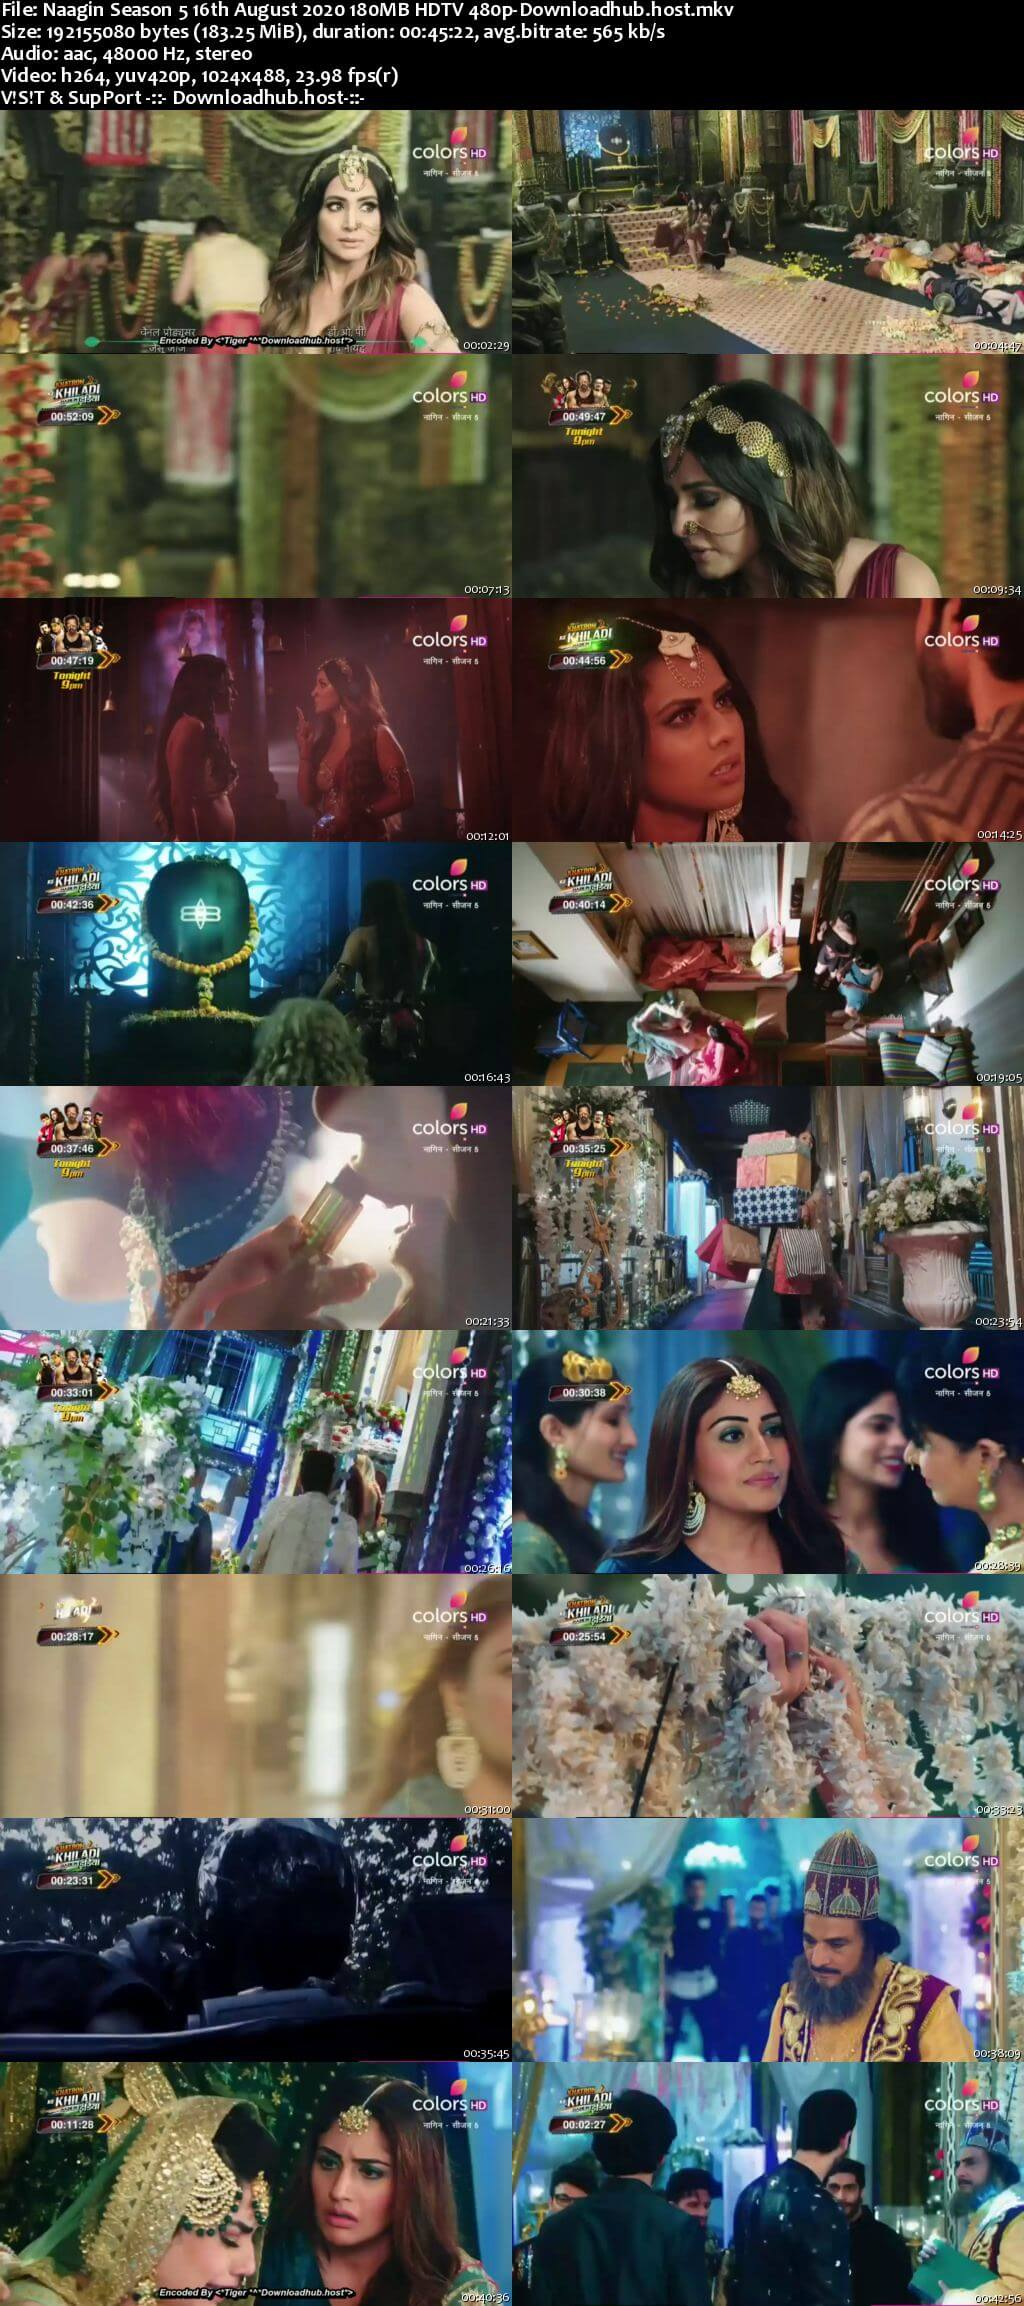 Naagin Season 5 16th August 2020 180MB HDTV 480p